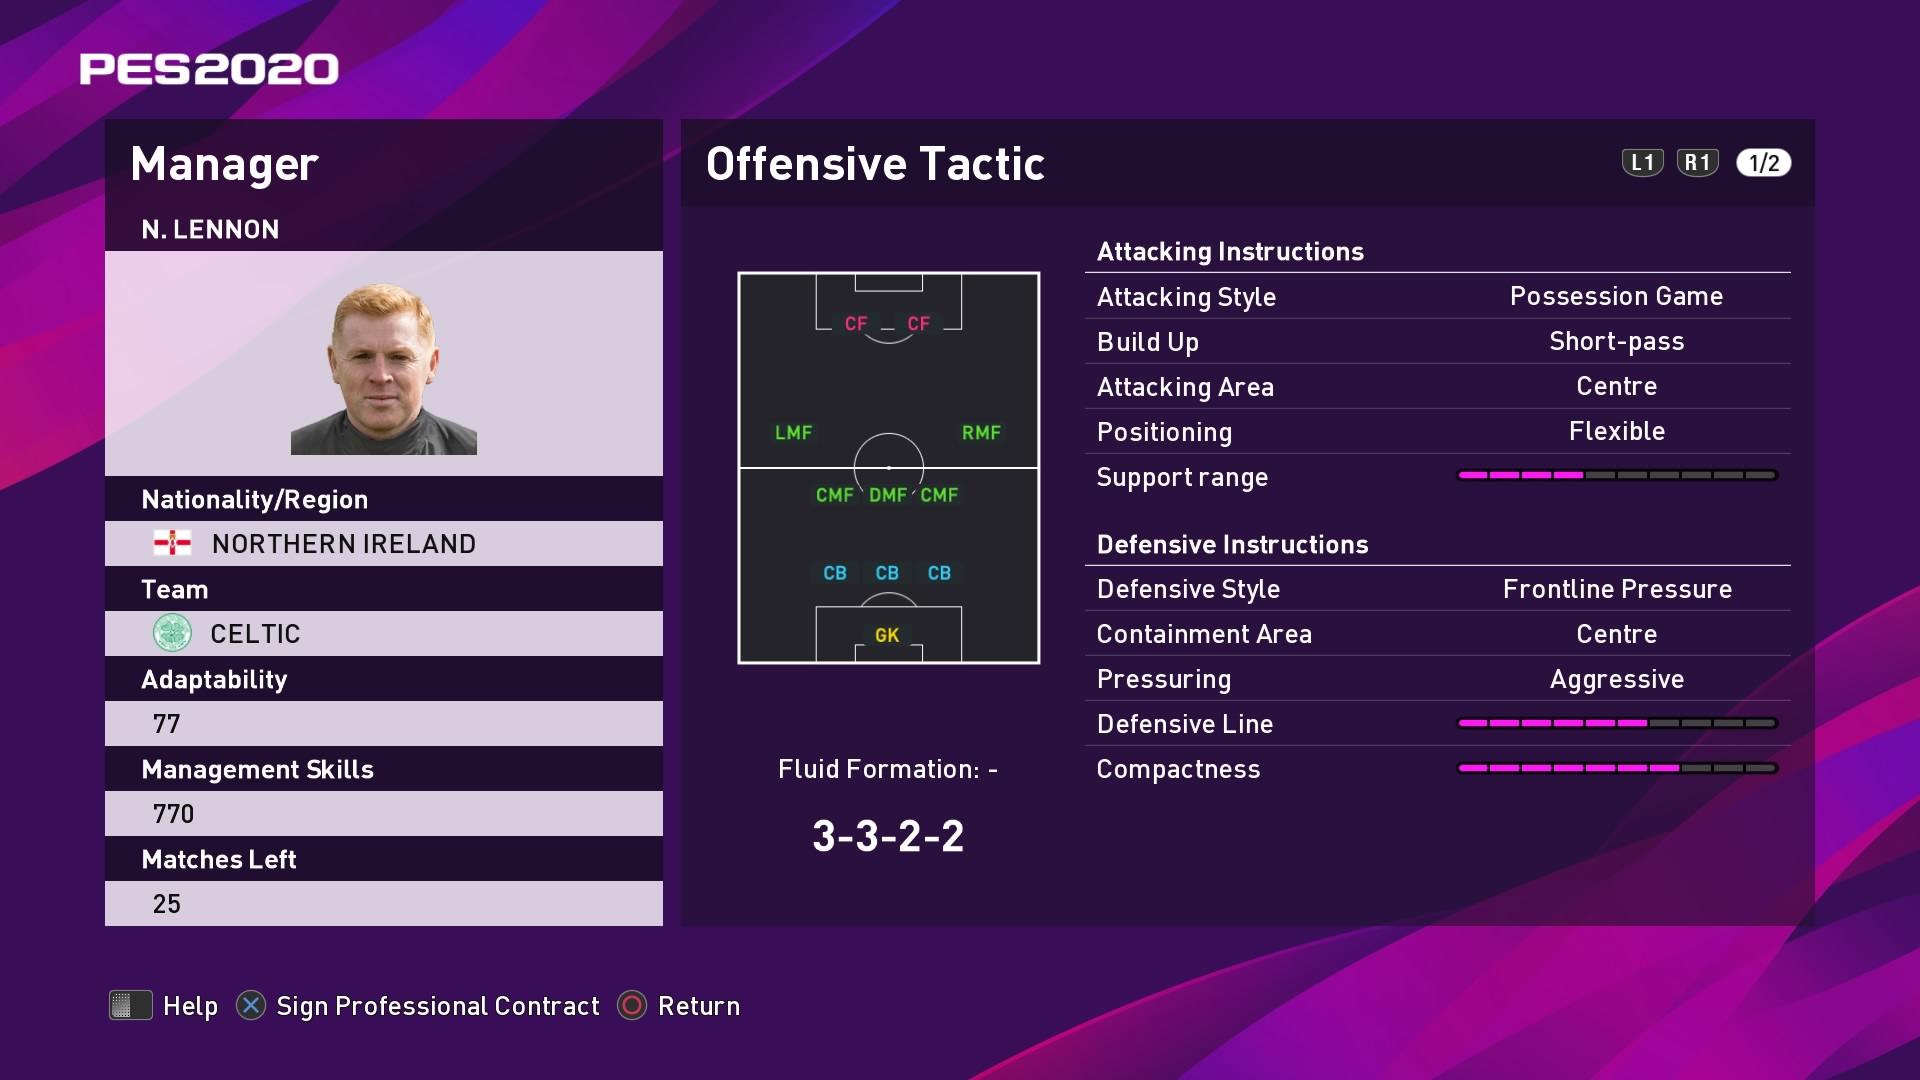 N. Lennon (2) (Neil Lennon) Offensive Tactic in PES 2020 myClub